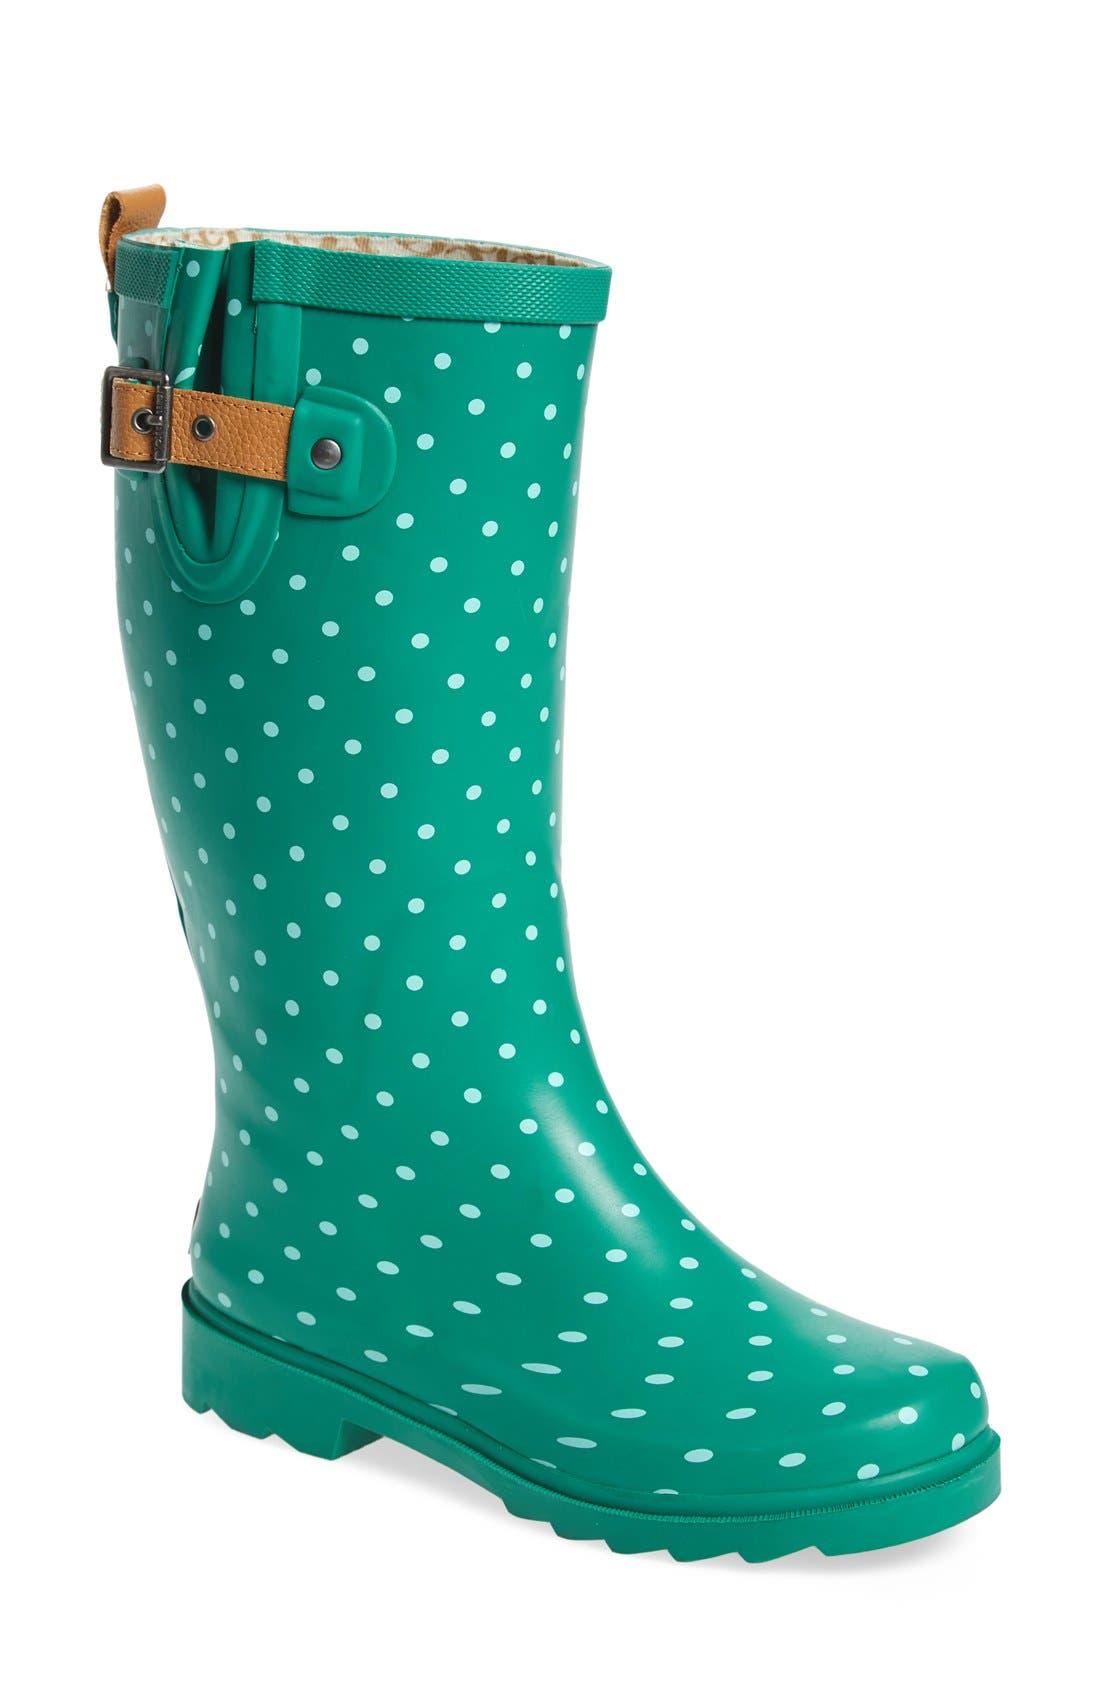 Alternate Image 1 Selected - Chooka 'Classic Dot' Rain Boot (Women)